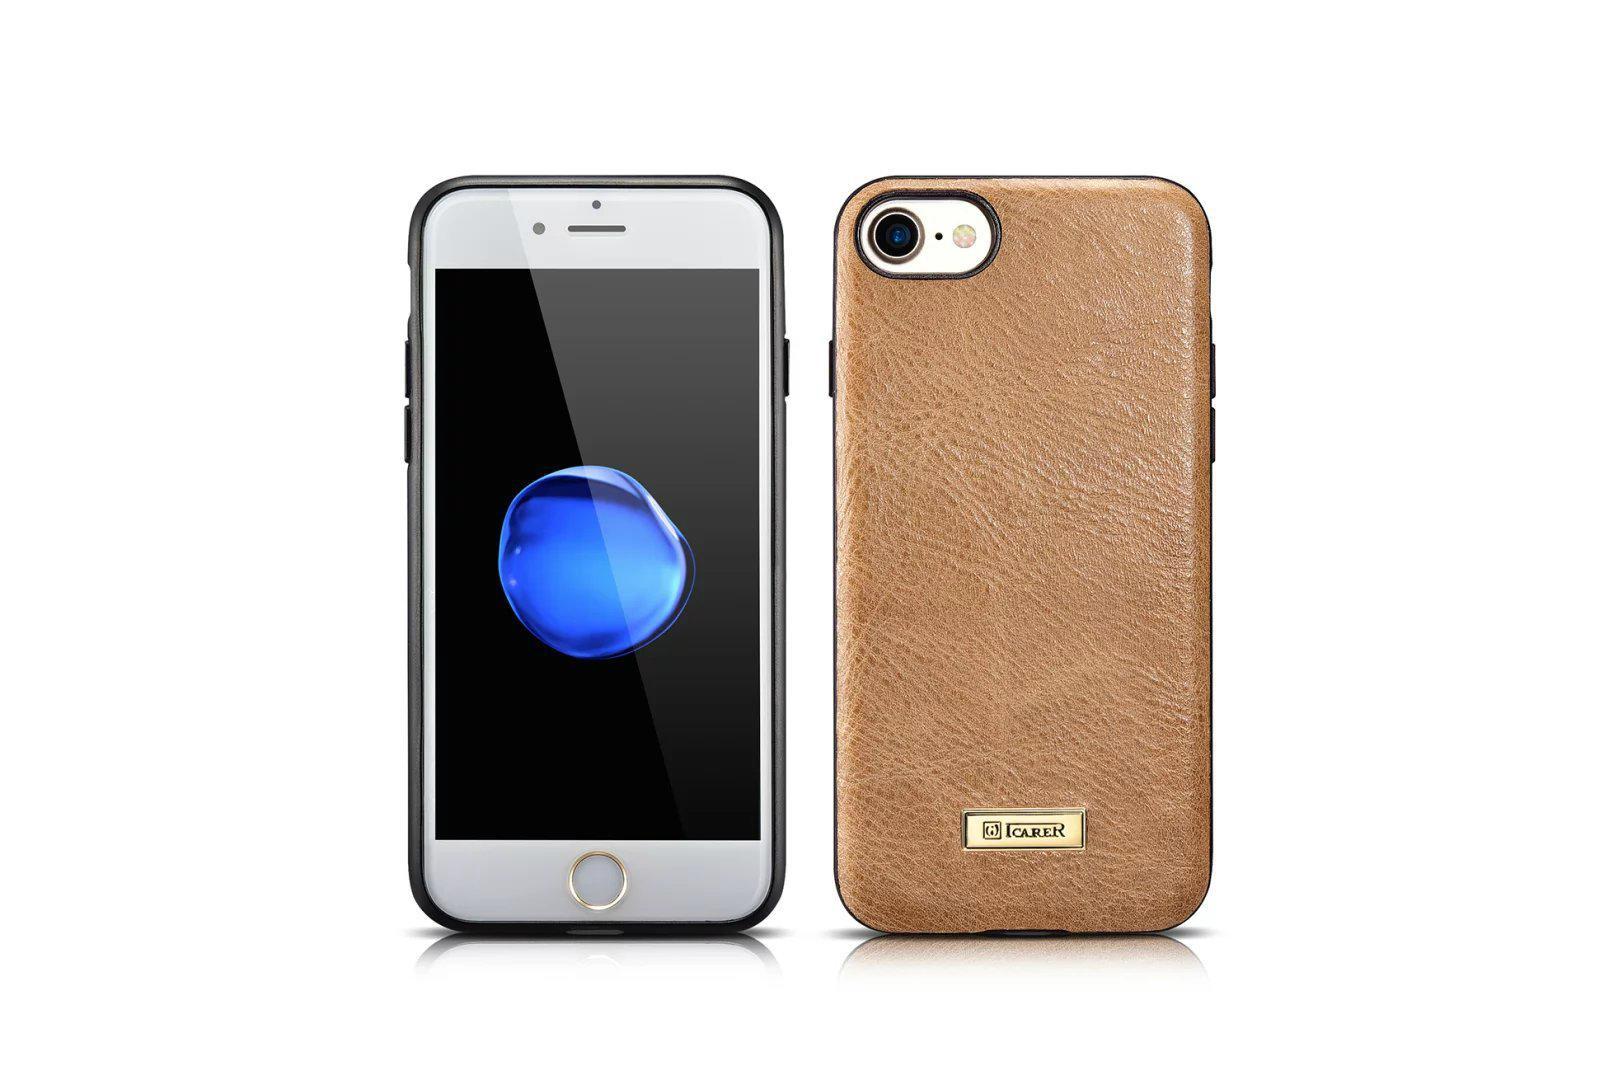 iCarer iPhone 7 Shenzhou Genuine Leather Fashional Back Cover Case 3